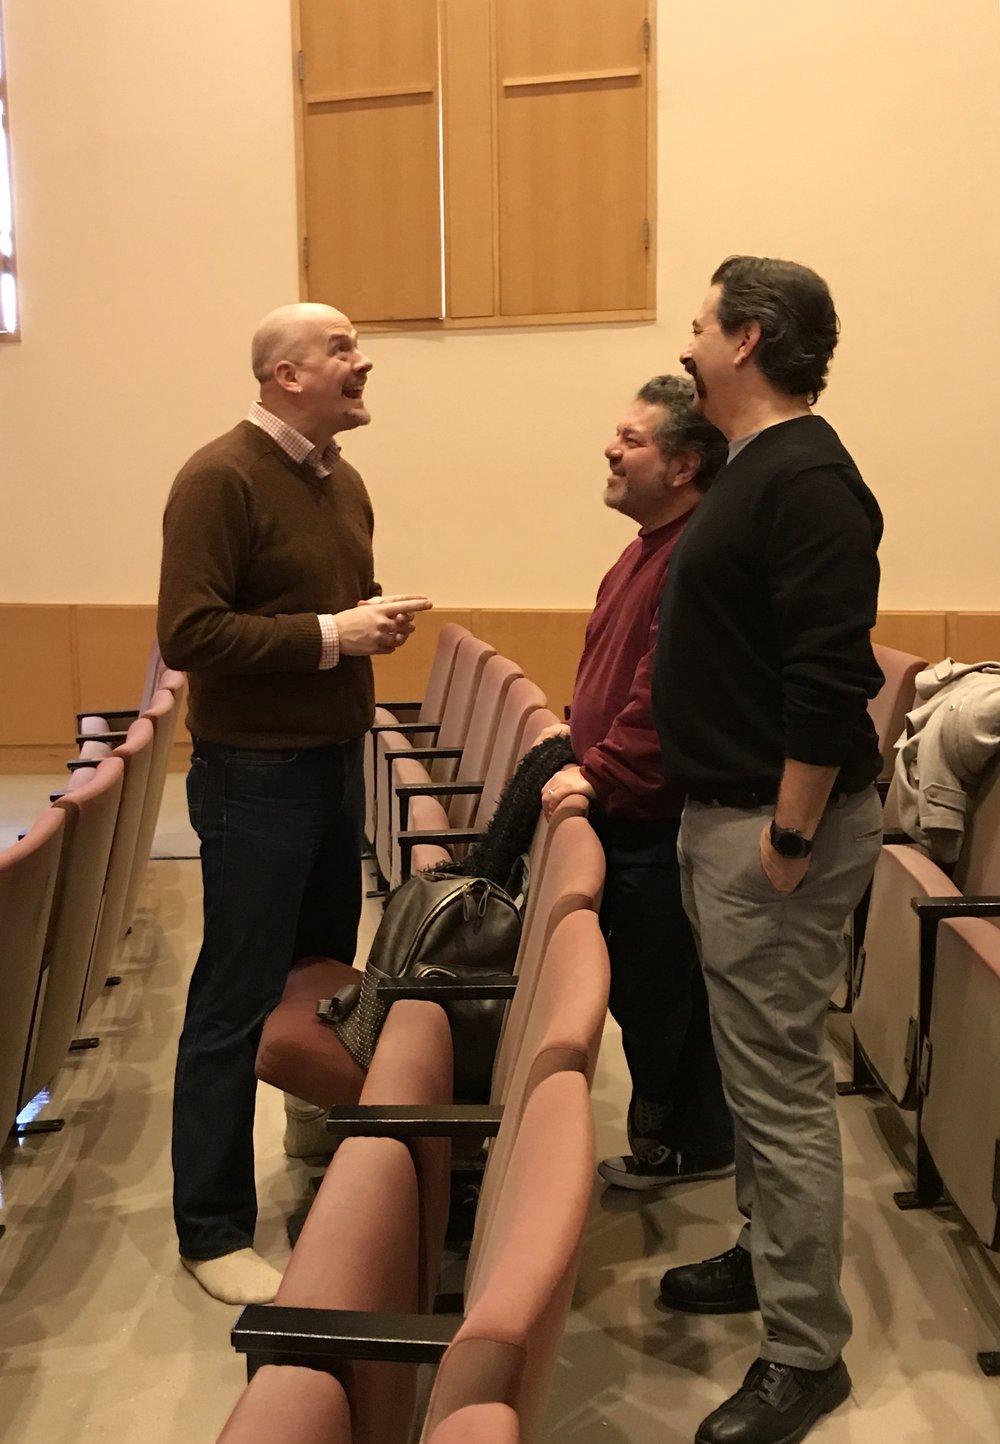 Brandon McShaffrey, Allen Zipper & Dave Caplan